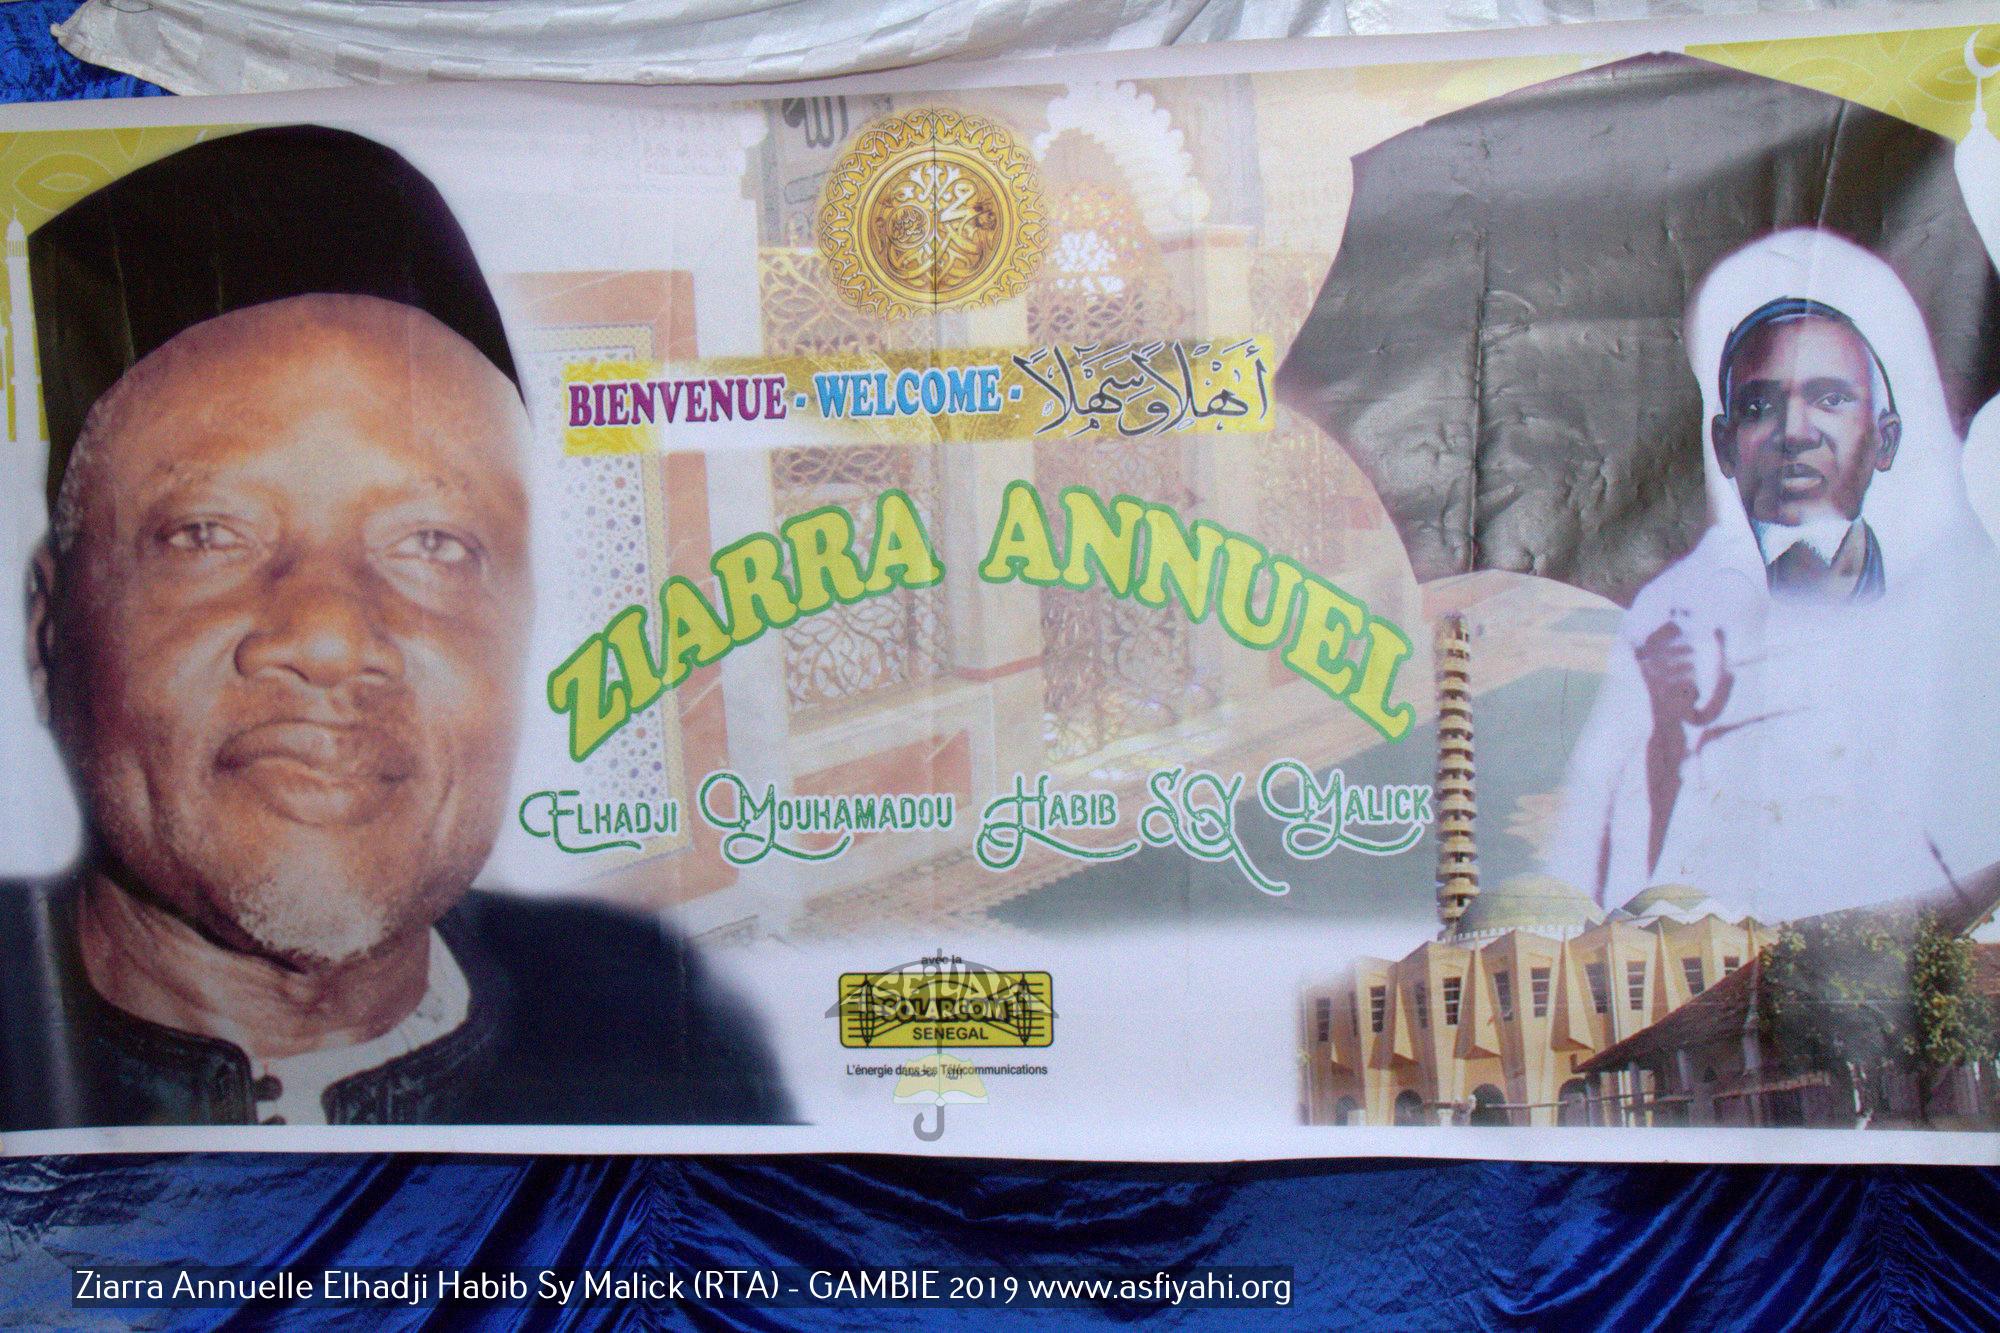 "PHOTOS - GAMBIE - Les Images de la Ziarra annuelle El hadji Habib Sy Malick (rta) ""Takussan Naby"", présidé par Serigne Mame Ousmane Sy Habib"